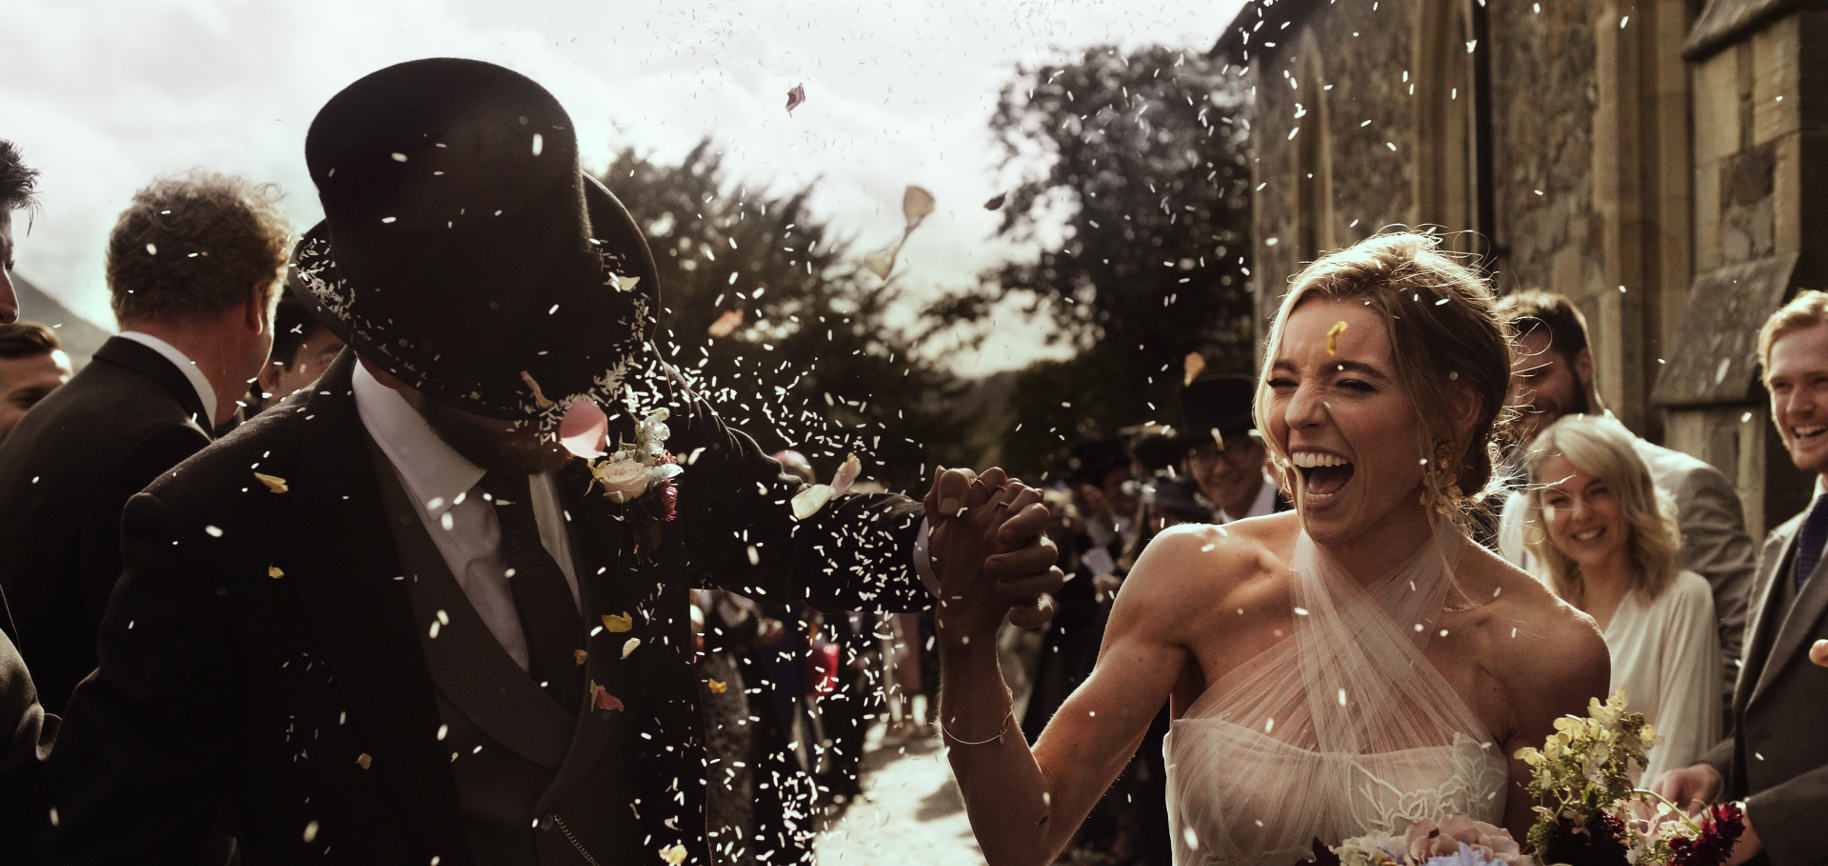 plas dinam country house wales wedding videographer uk destination film